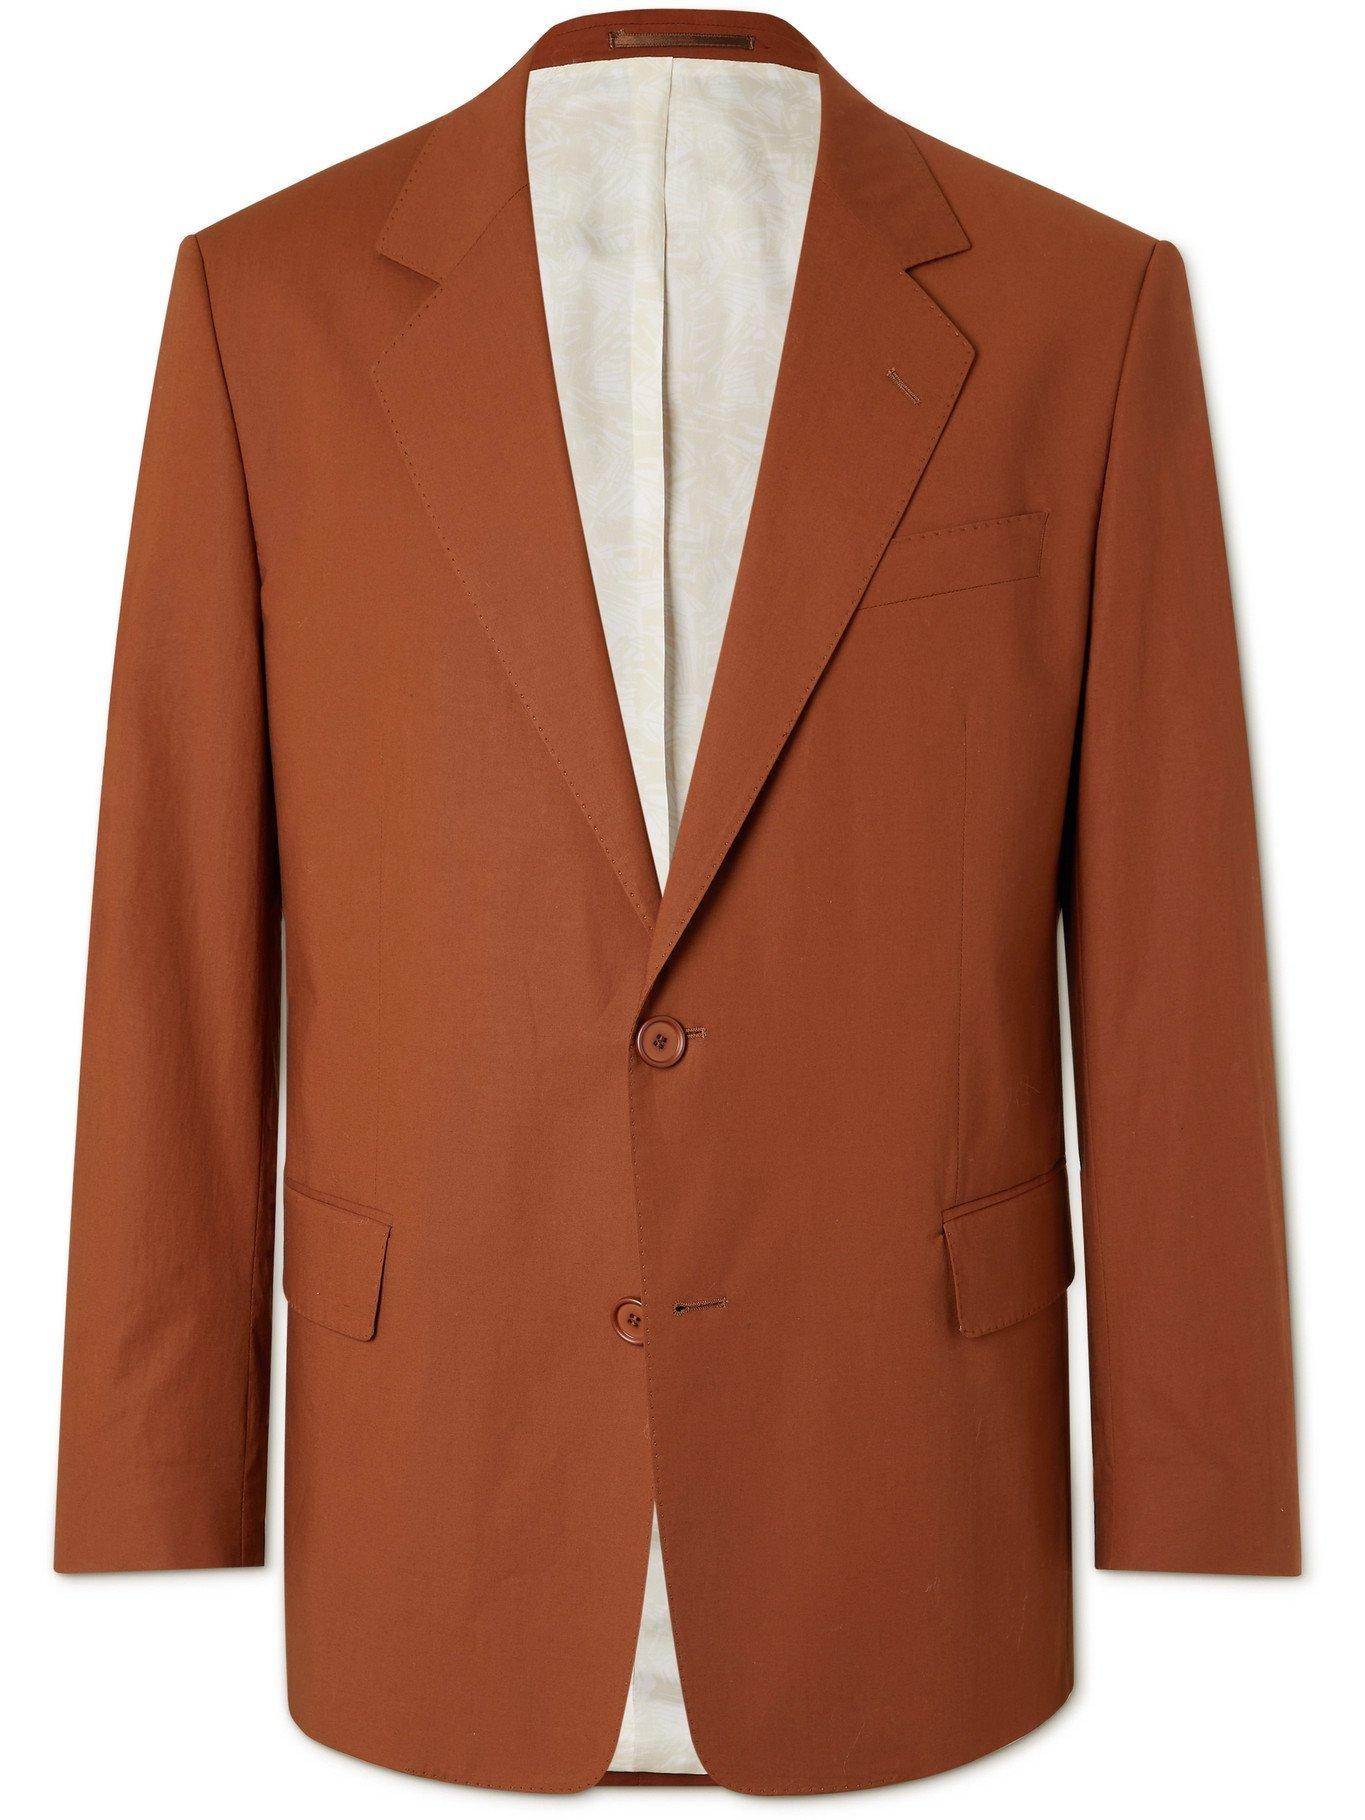 HUGO BOSS - Cemdon Stretch-Cotton Blazer - Brown